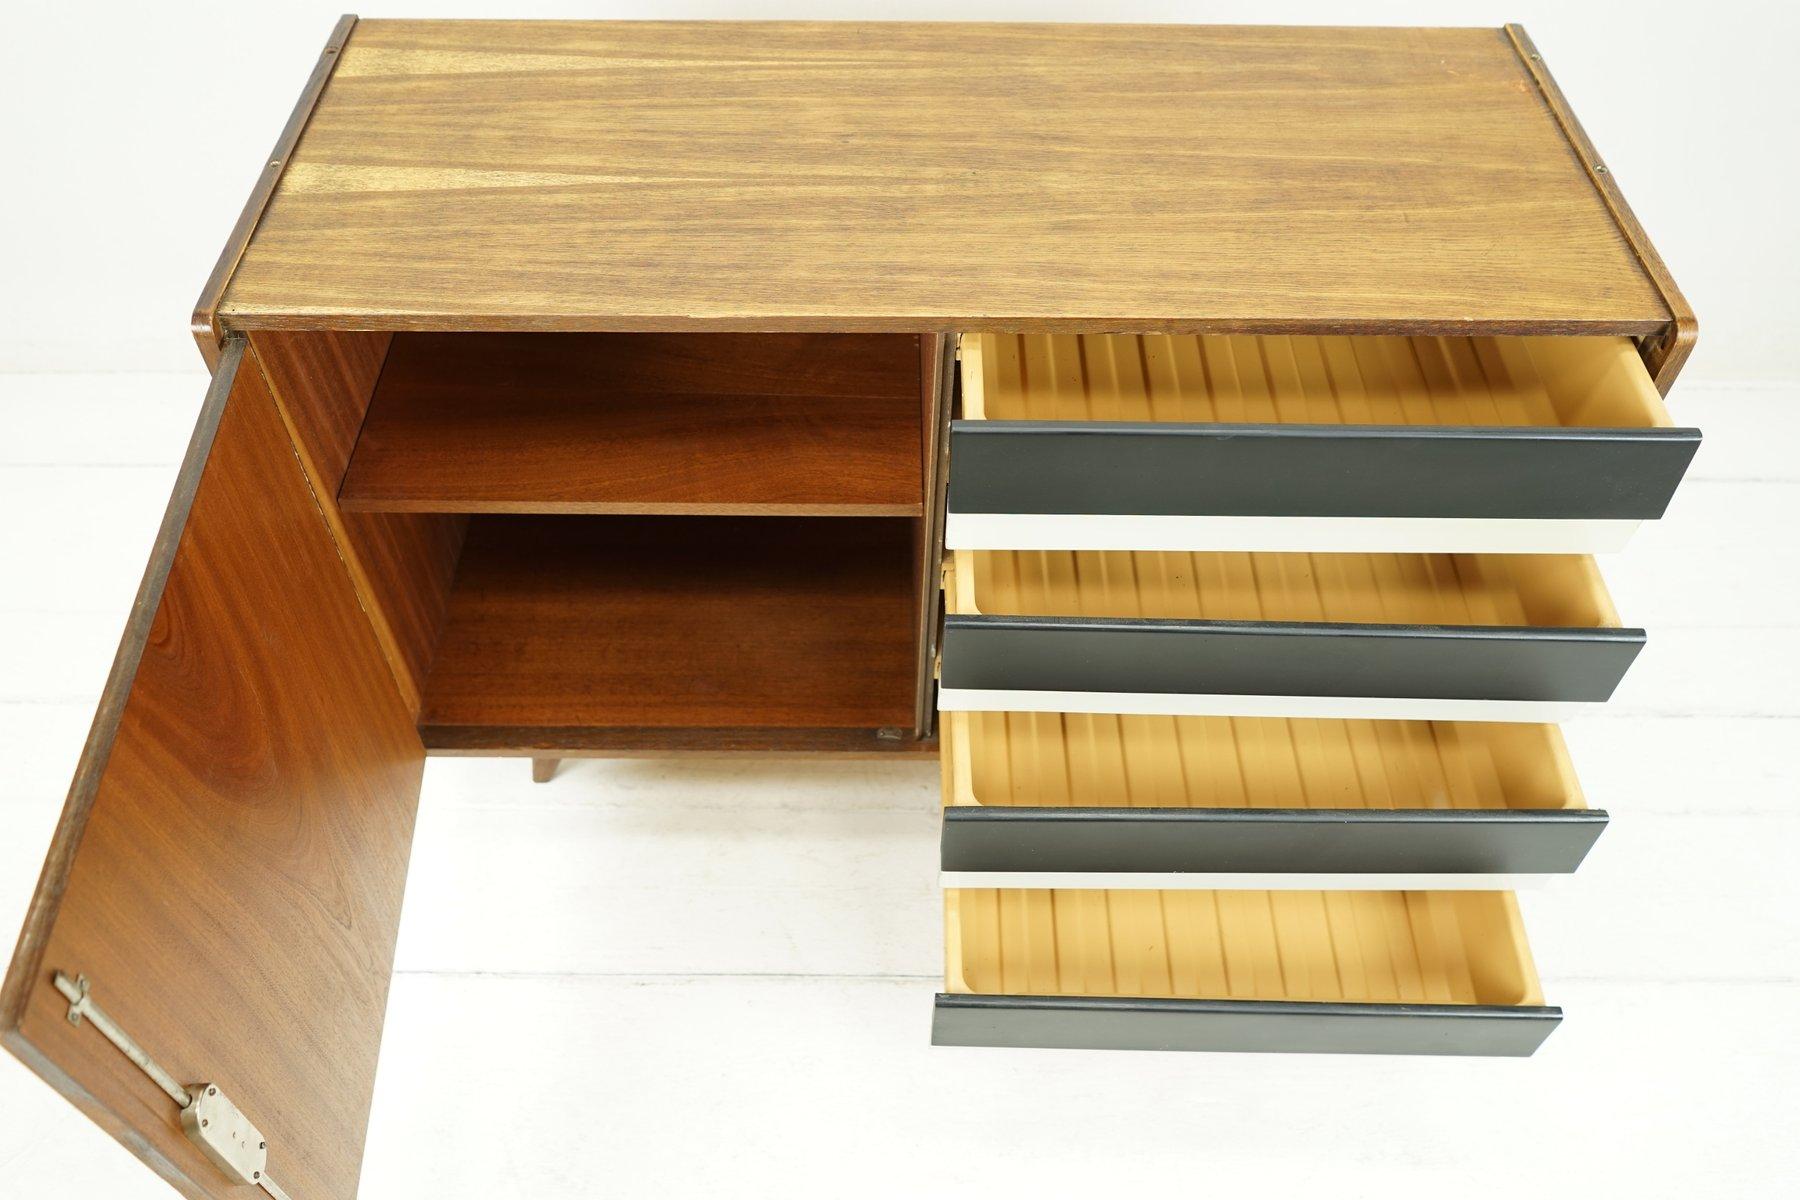 mid century sideboard in schwarz wei von ji jiroutek. Black Bedroom Furniture Sets. Home Design Ideas